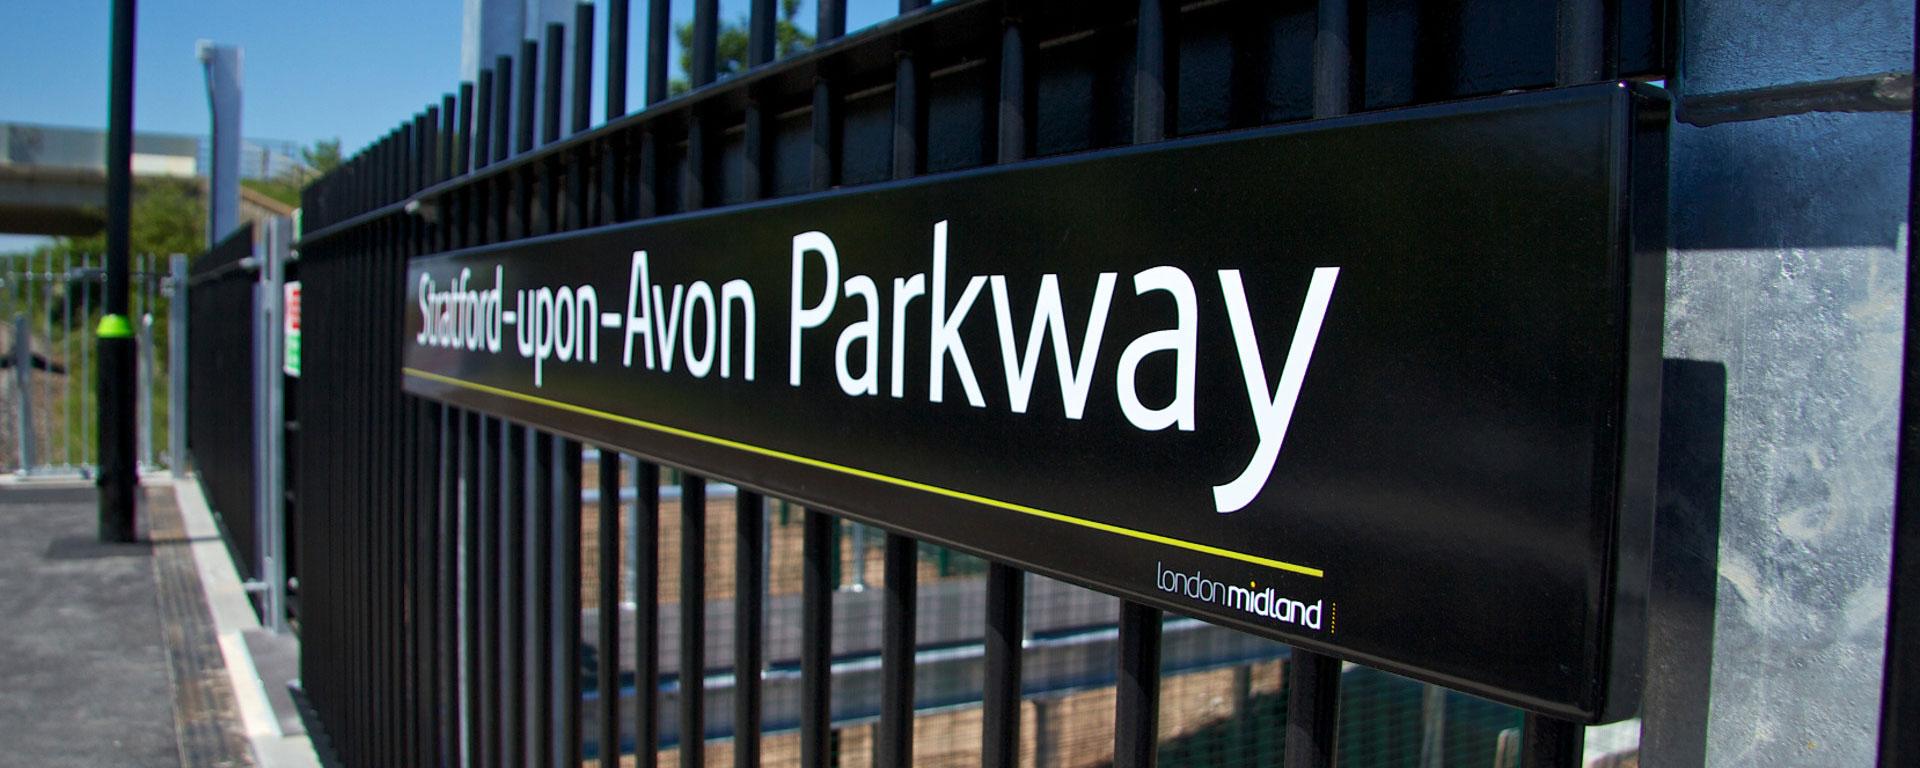 Vitreous enamel signage at Stratford Upon Avon Parkway